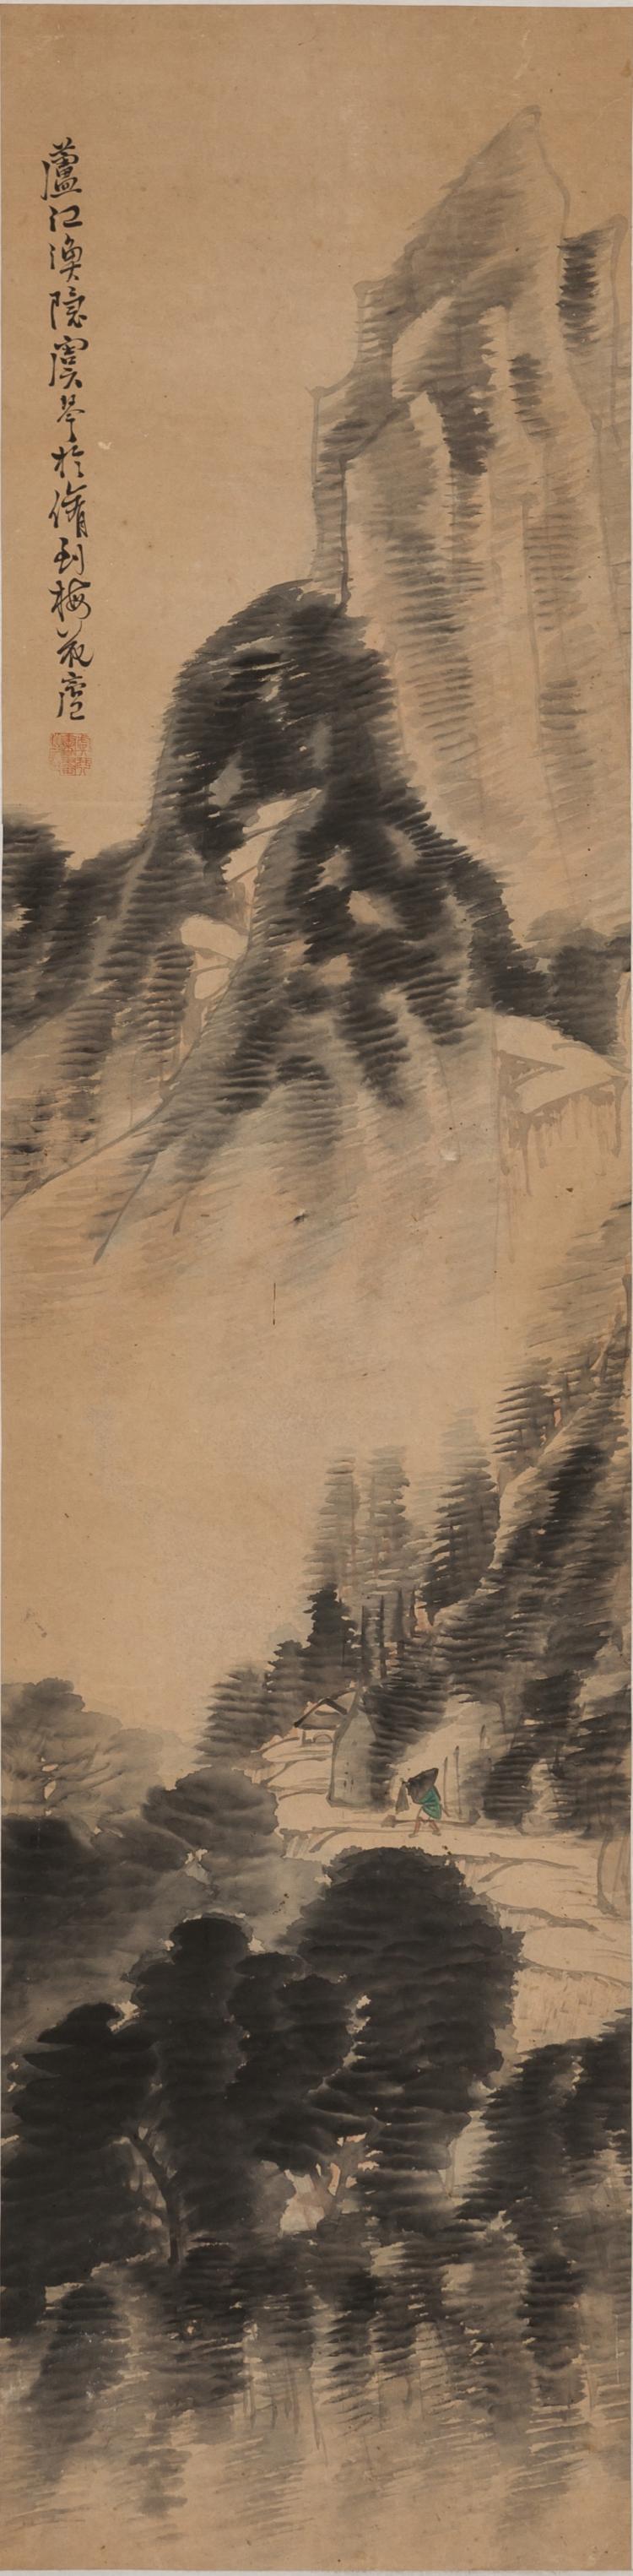 Yao Yu Ain (1867-1961)- Ink On Paper,Hanging Scroll